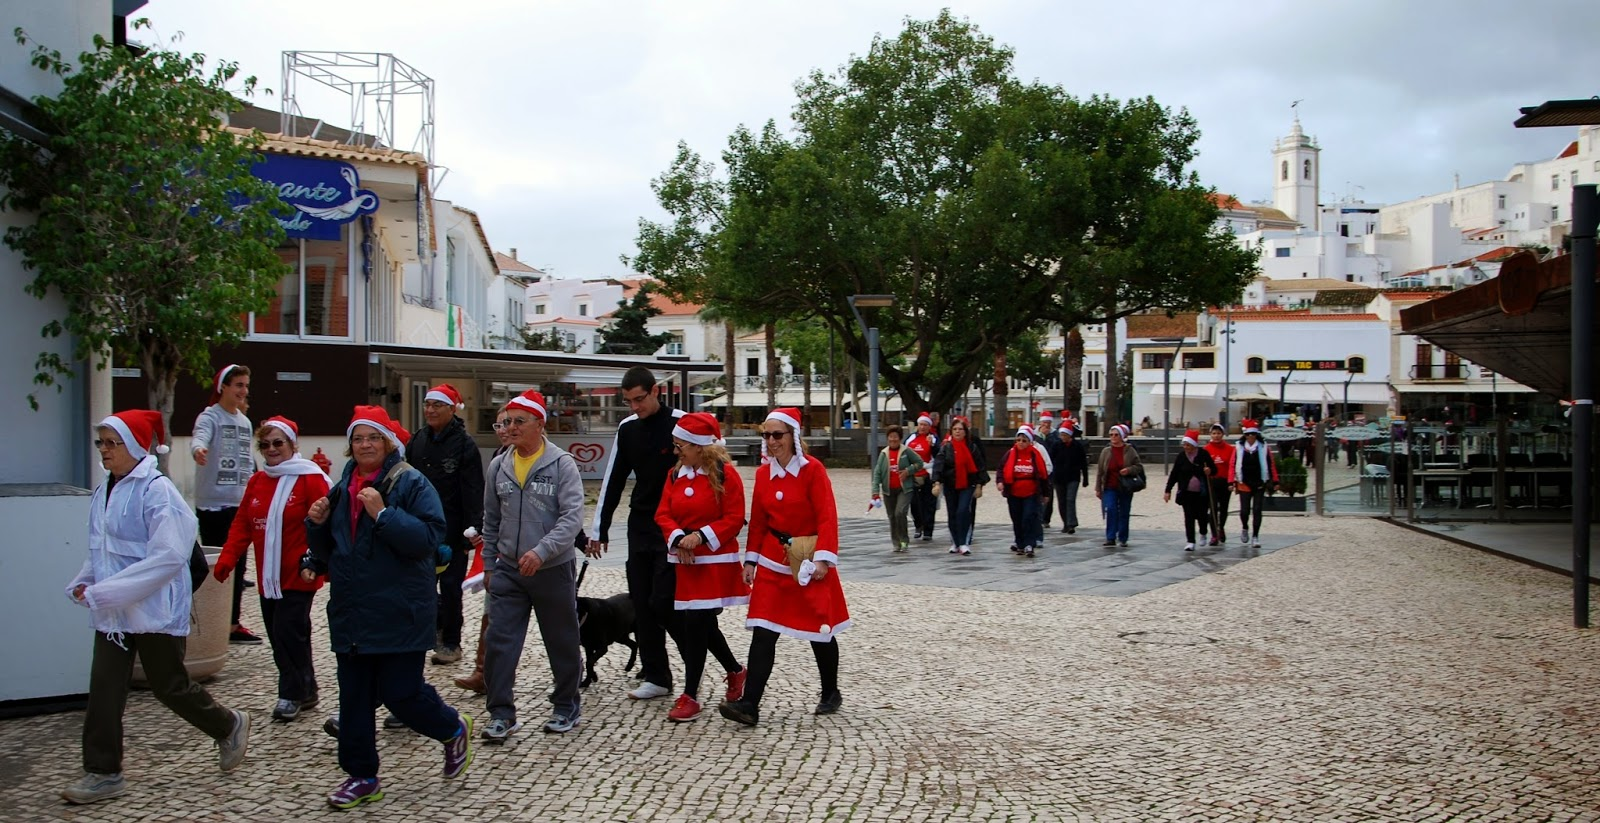 забег санта клаусов, албуфейра, праздники португалии